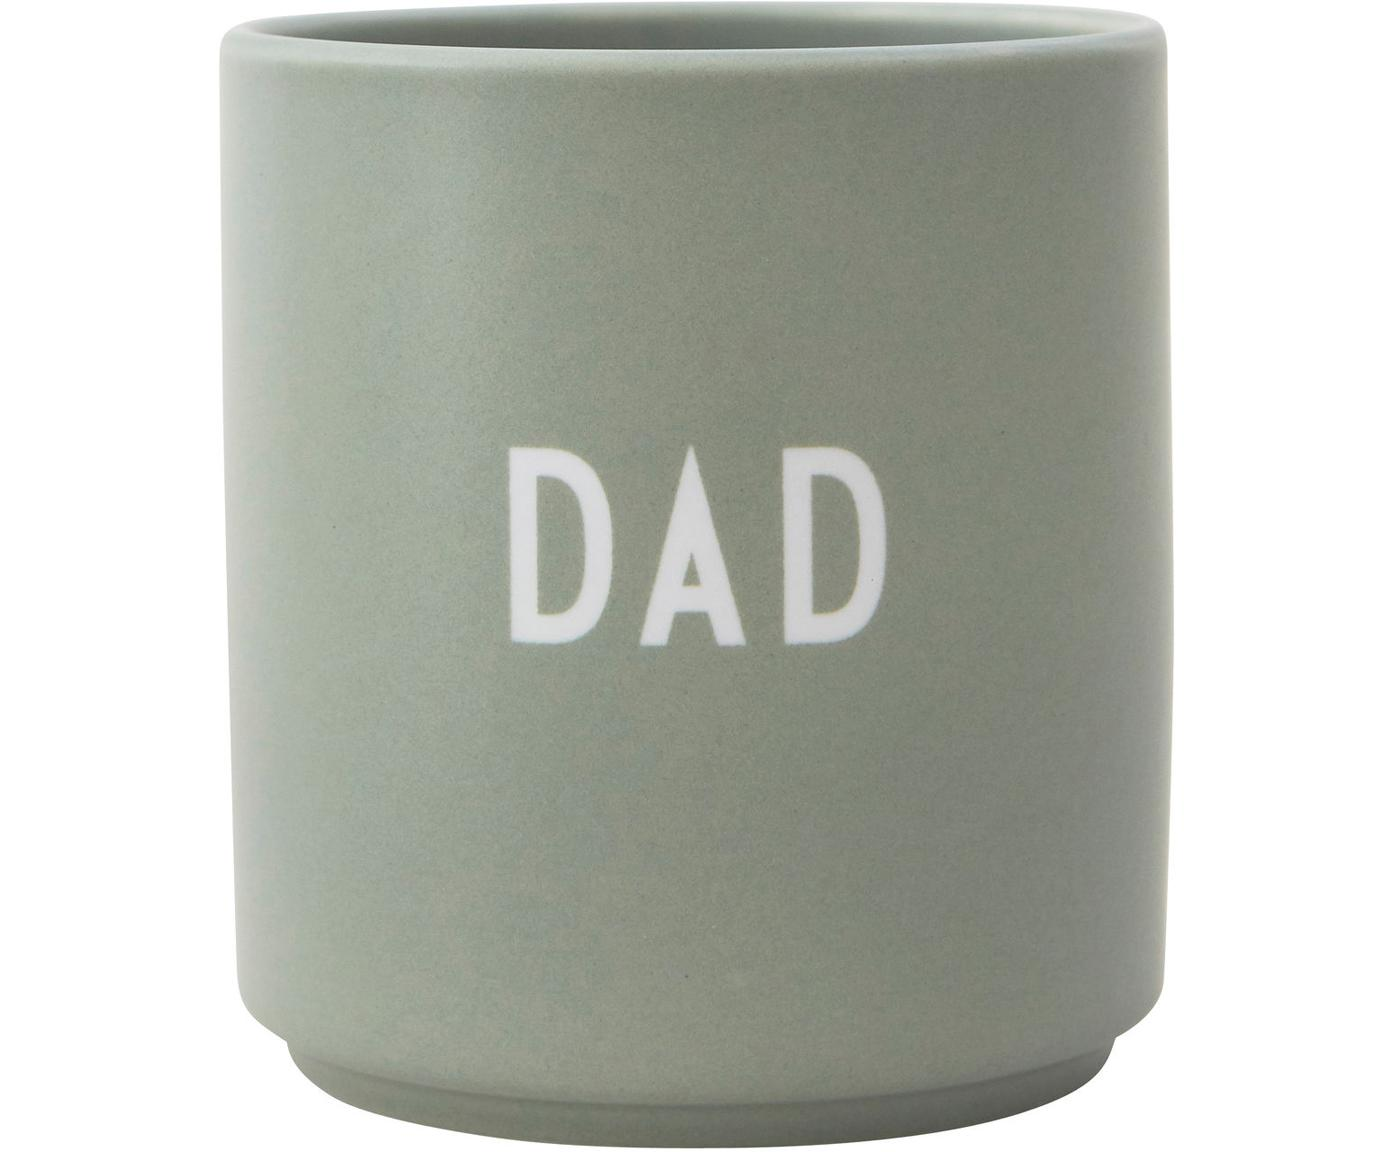 Design Becher Favourite DAD in Mint mit Schriftzug, Fine Bone China (Porzellan), Grün, Weiss, Ø 8 x H 9 cm